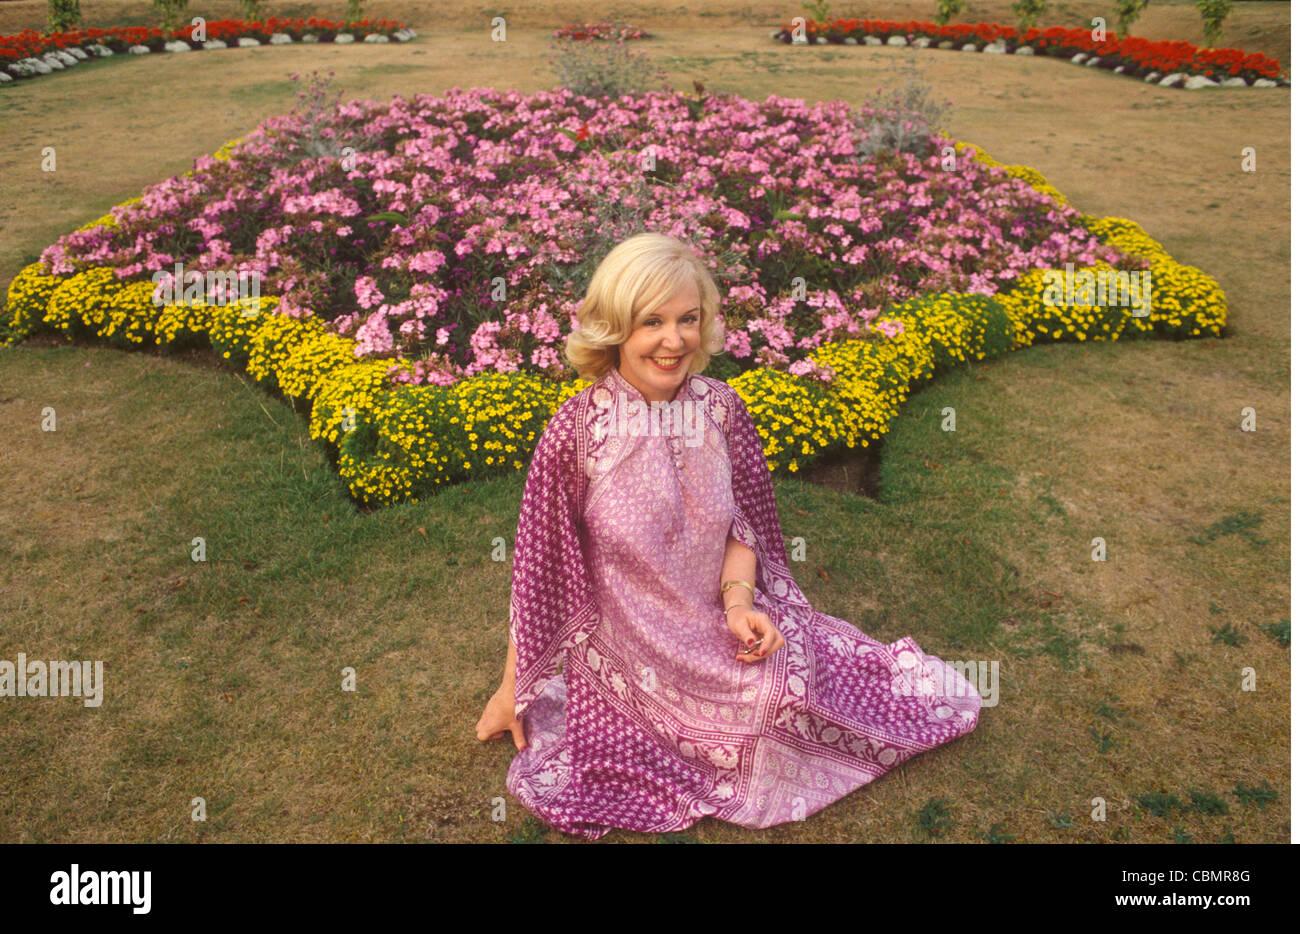 Kathy Kirby 'Volver' tour Cardiff Gales circa 1985. HOMER SYKES ARCHIVE Imagen De Stock